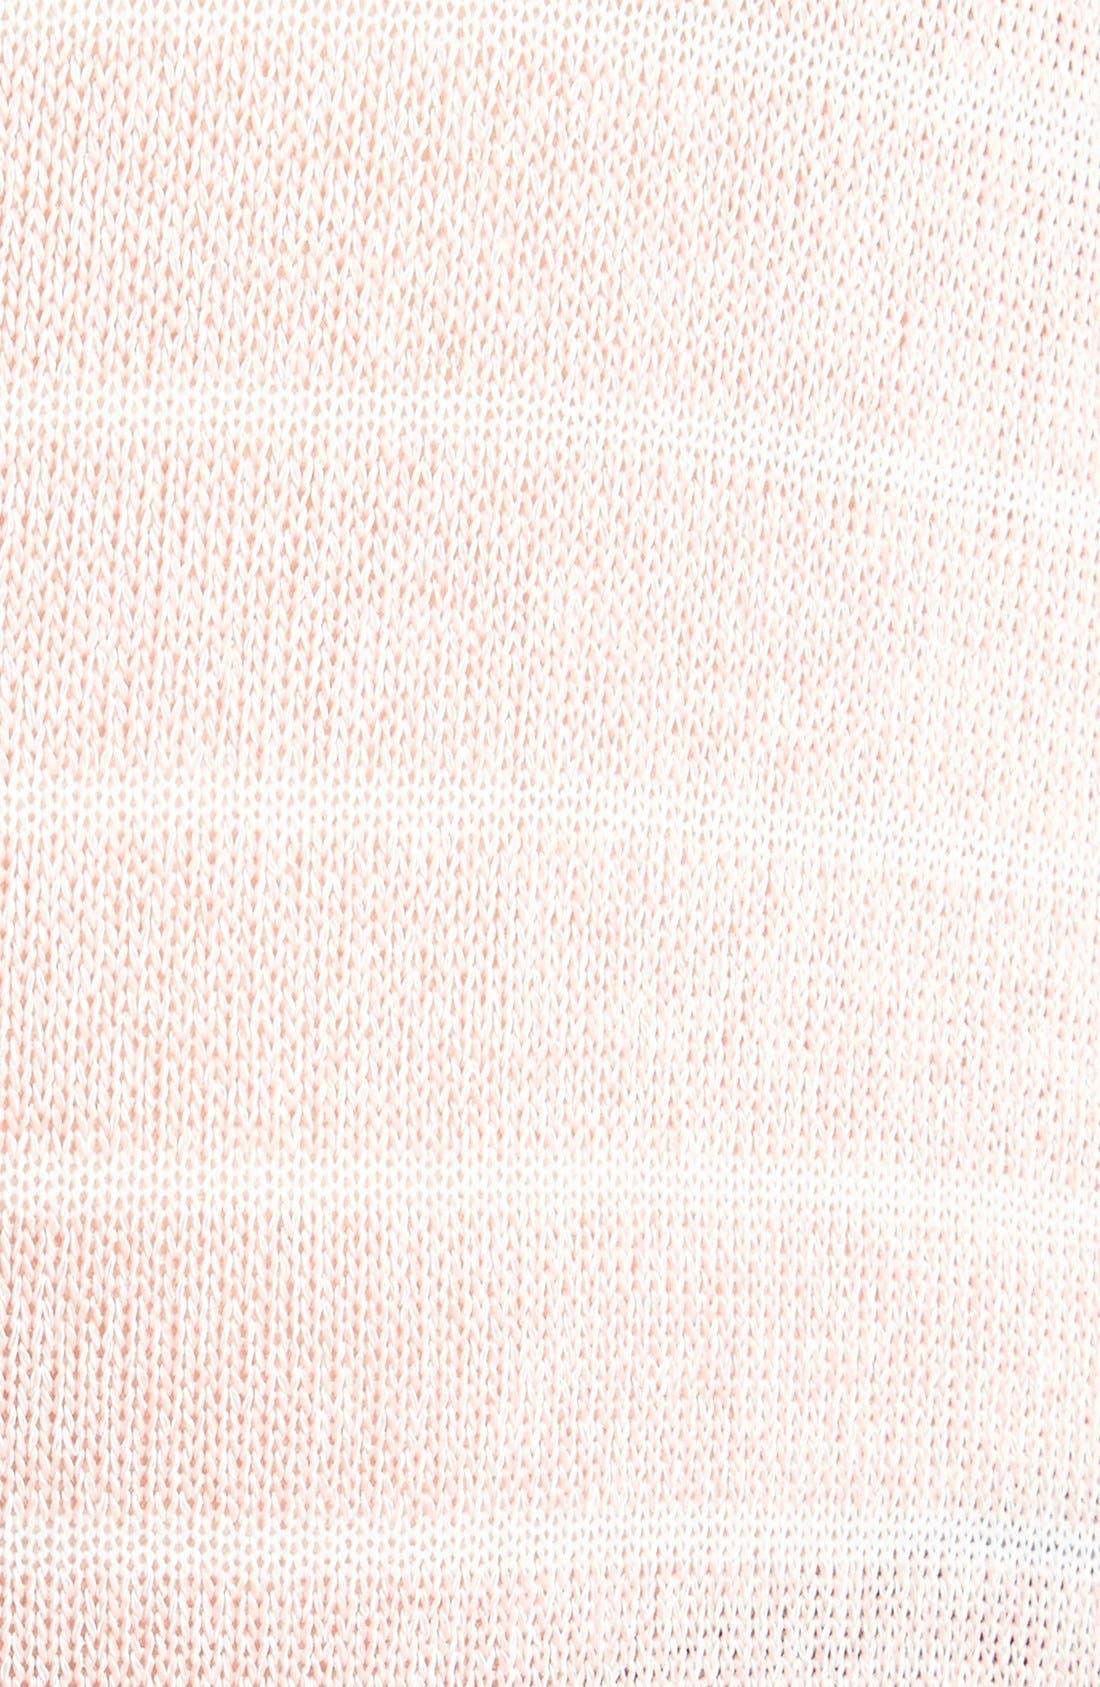 Alternate Image 3  - Jessica Simpson 'Scarlett Hatchi' Knit & Lace Top (Plus Size)